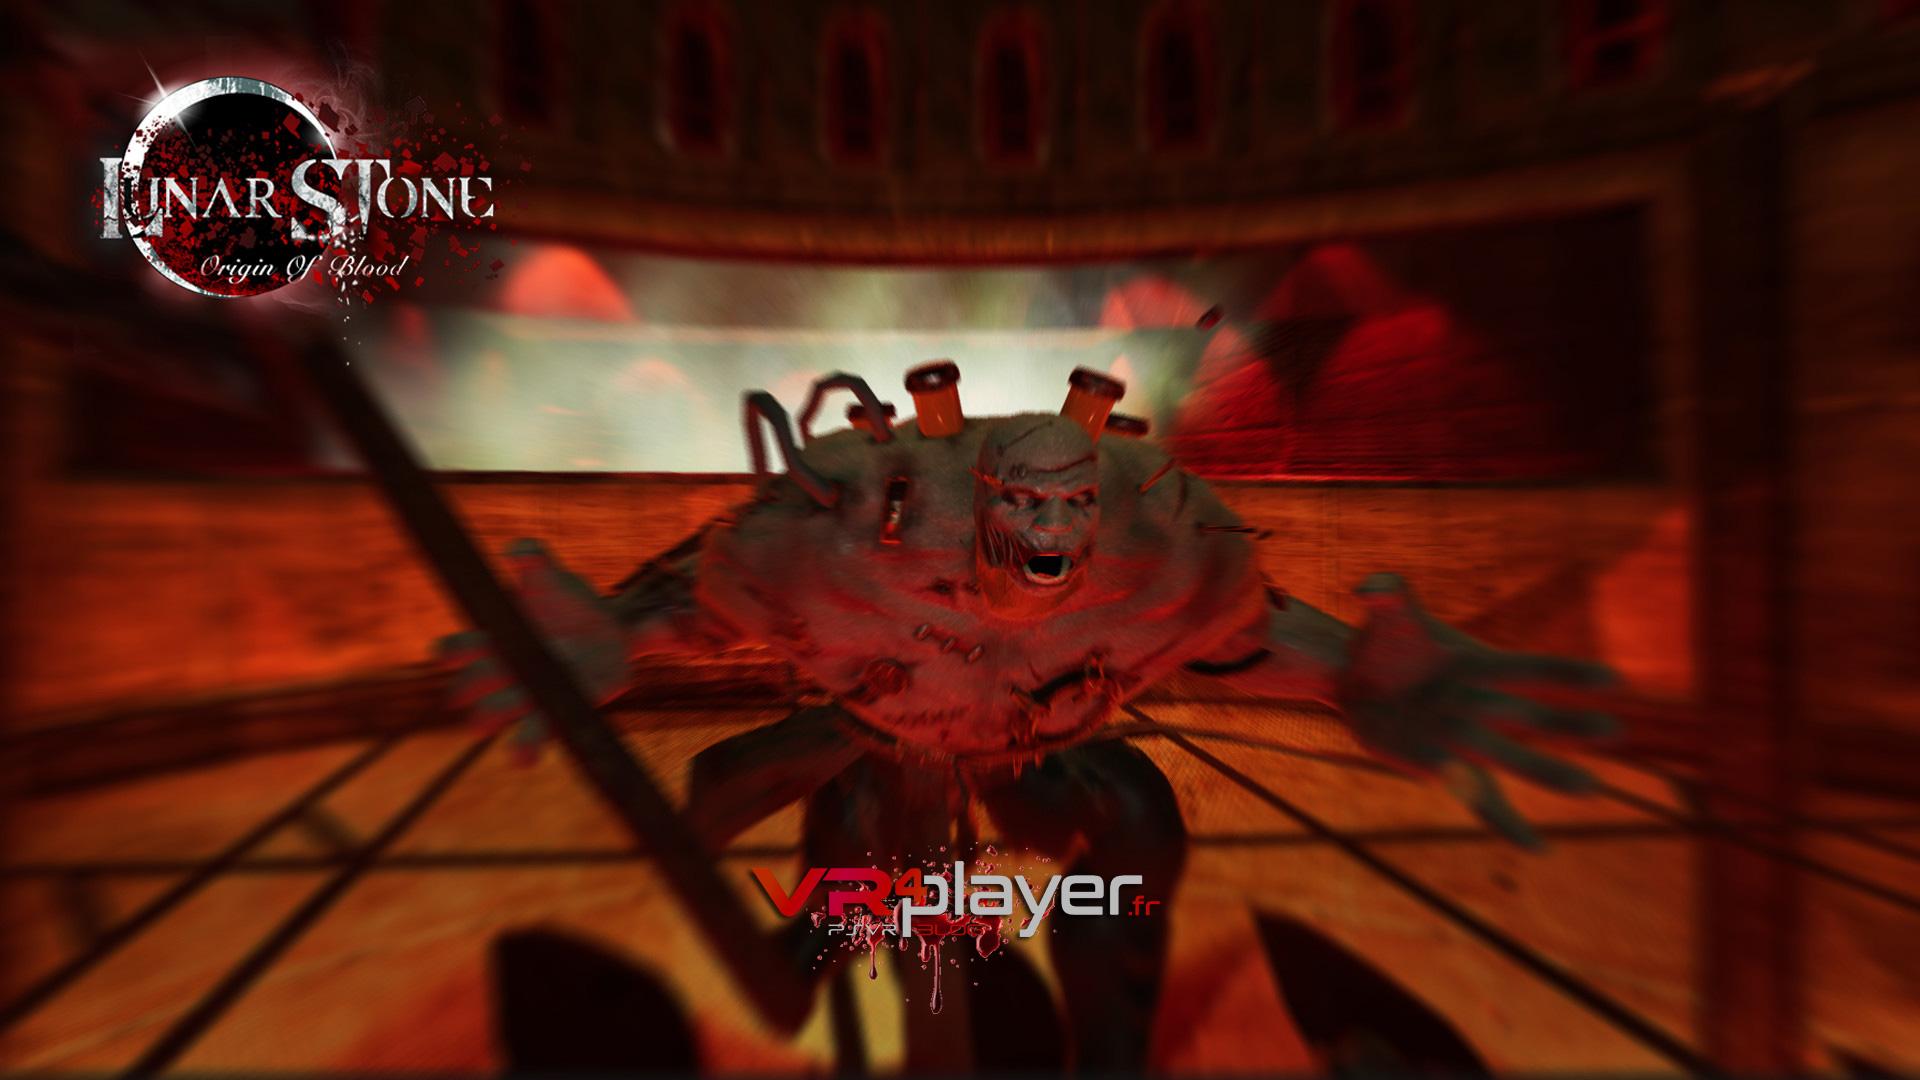 Lunar Stone Origin of Blood PlayStation VR vrplayer.fr